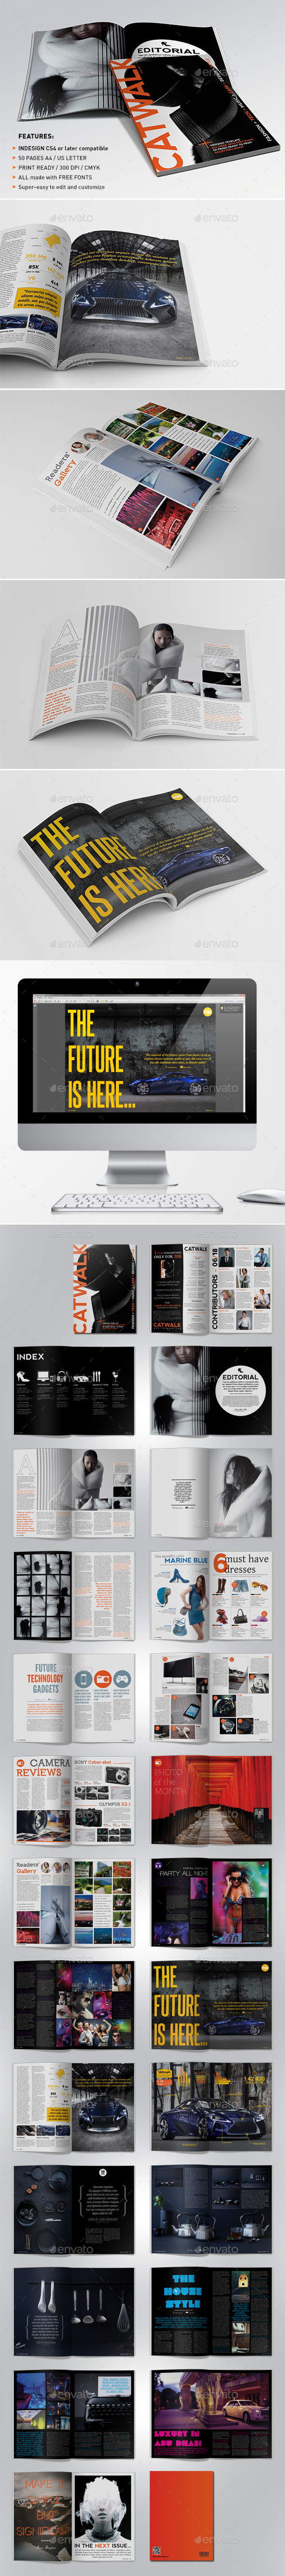 Catwalk Magazine Indesign Template - Magazines Print Templates